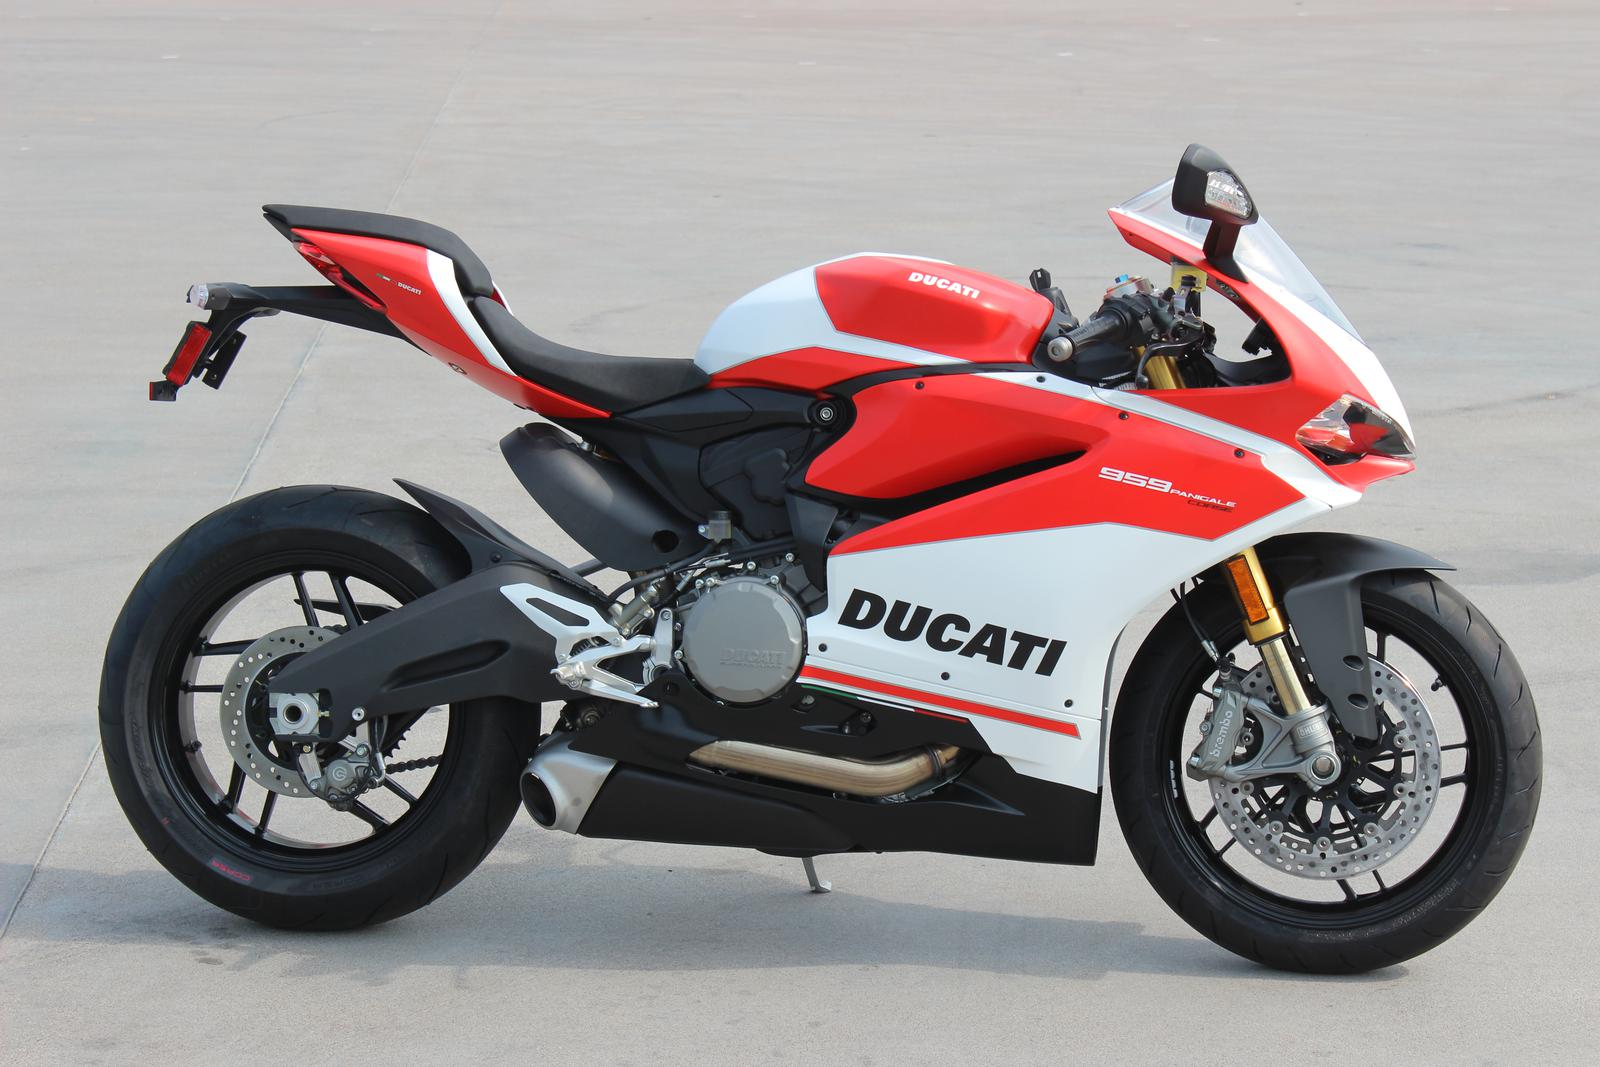 2018 Ducati 959 Panigale Corse For Sale In Scottsdale Az Go Az